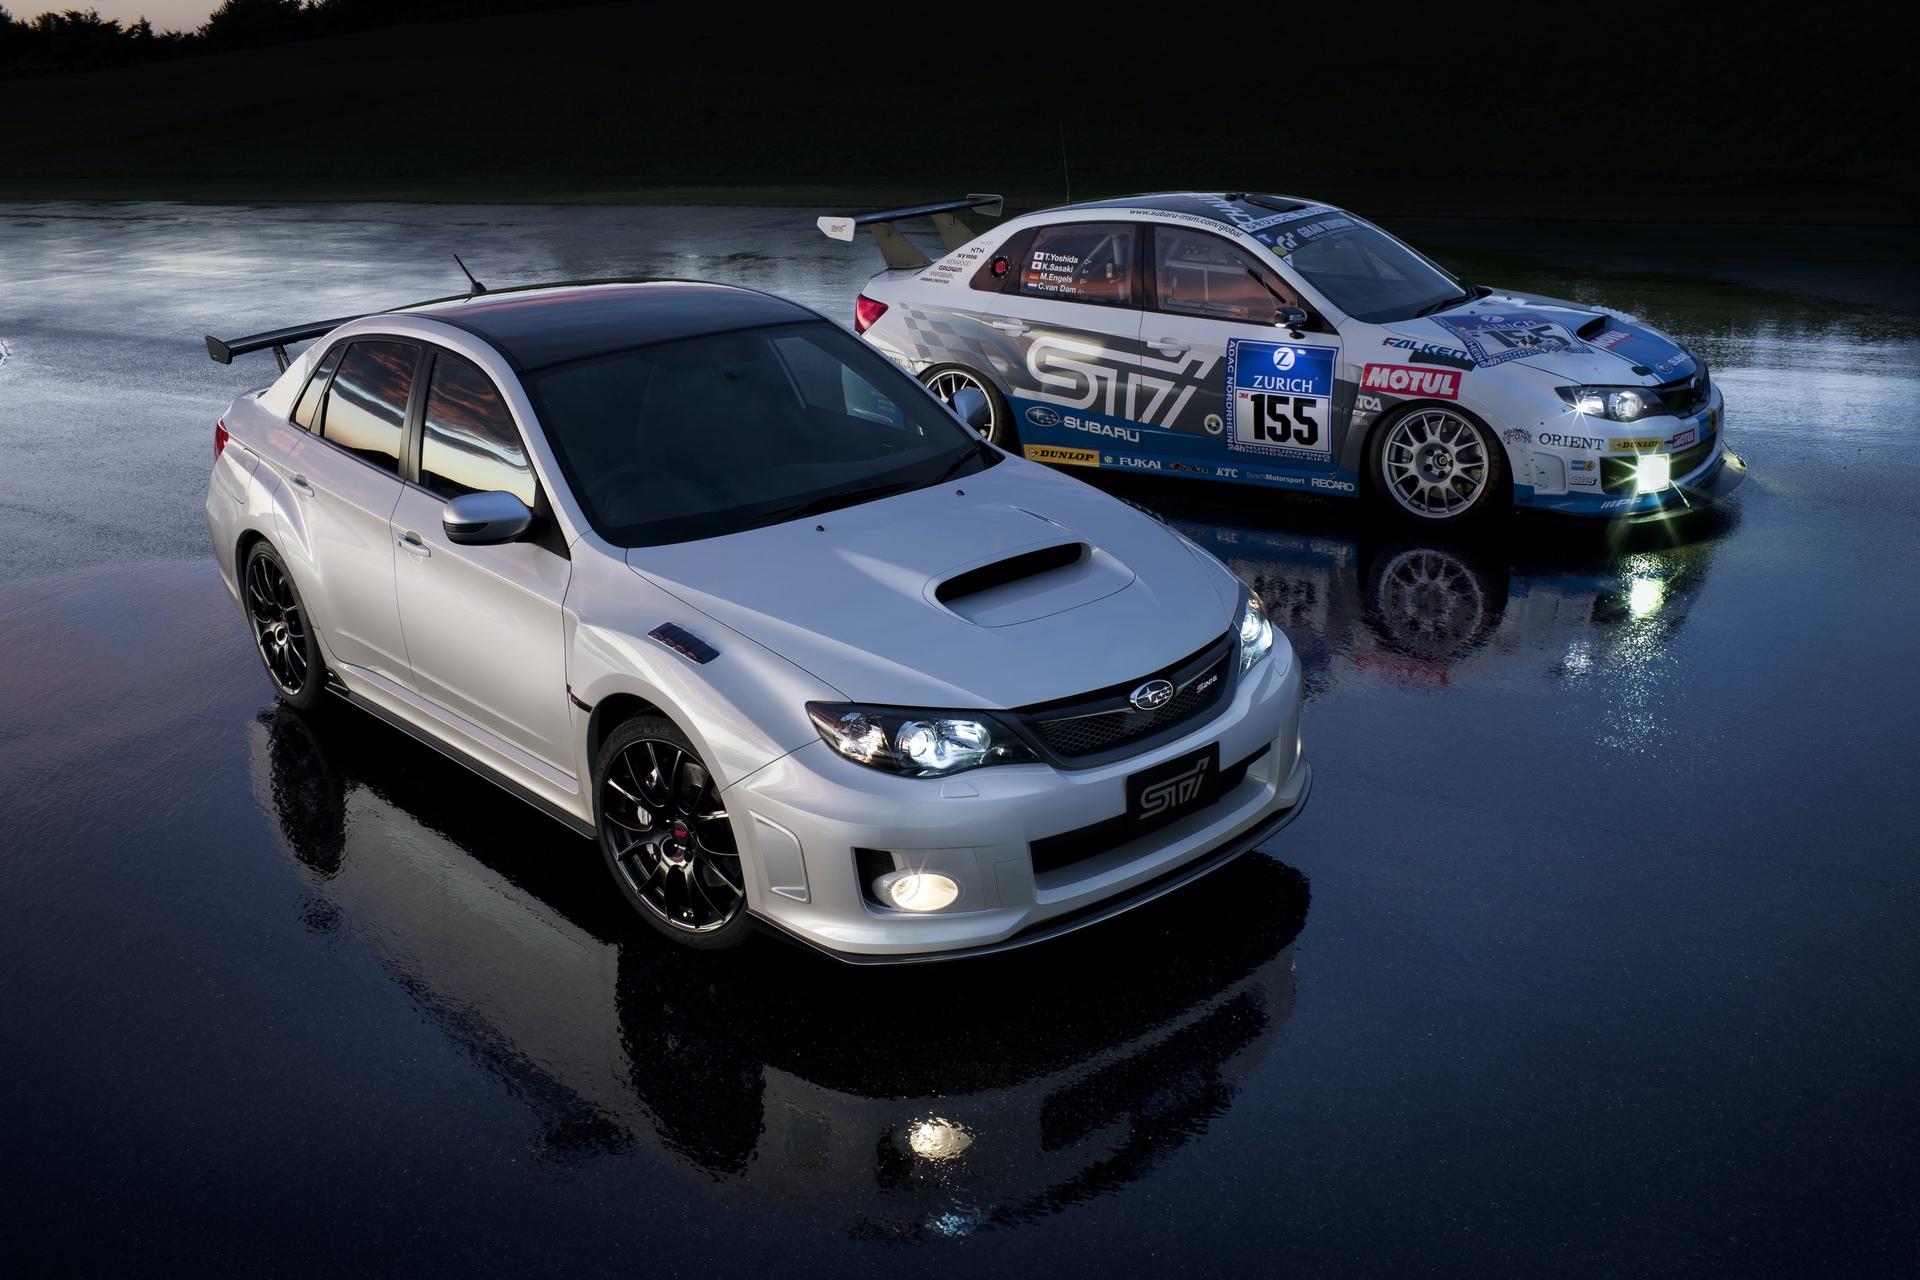 Subaru_Impreza_STI_S206_NBR_Challenge_Package_0003